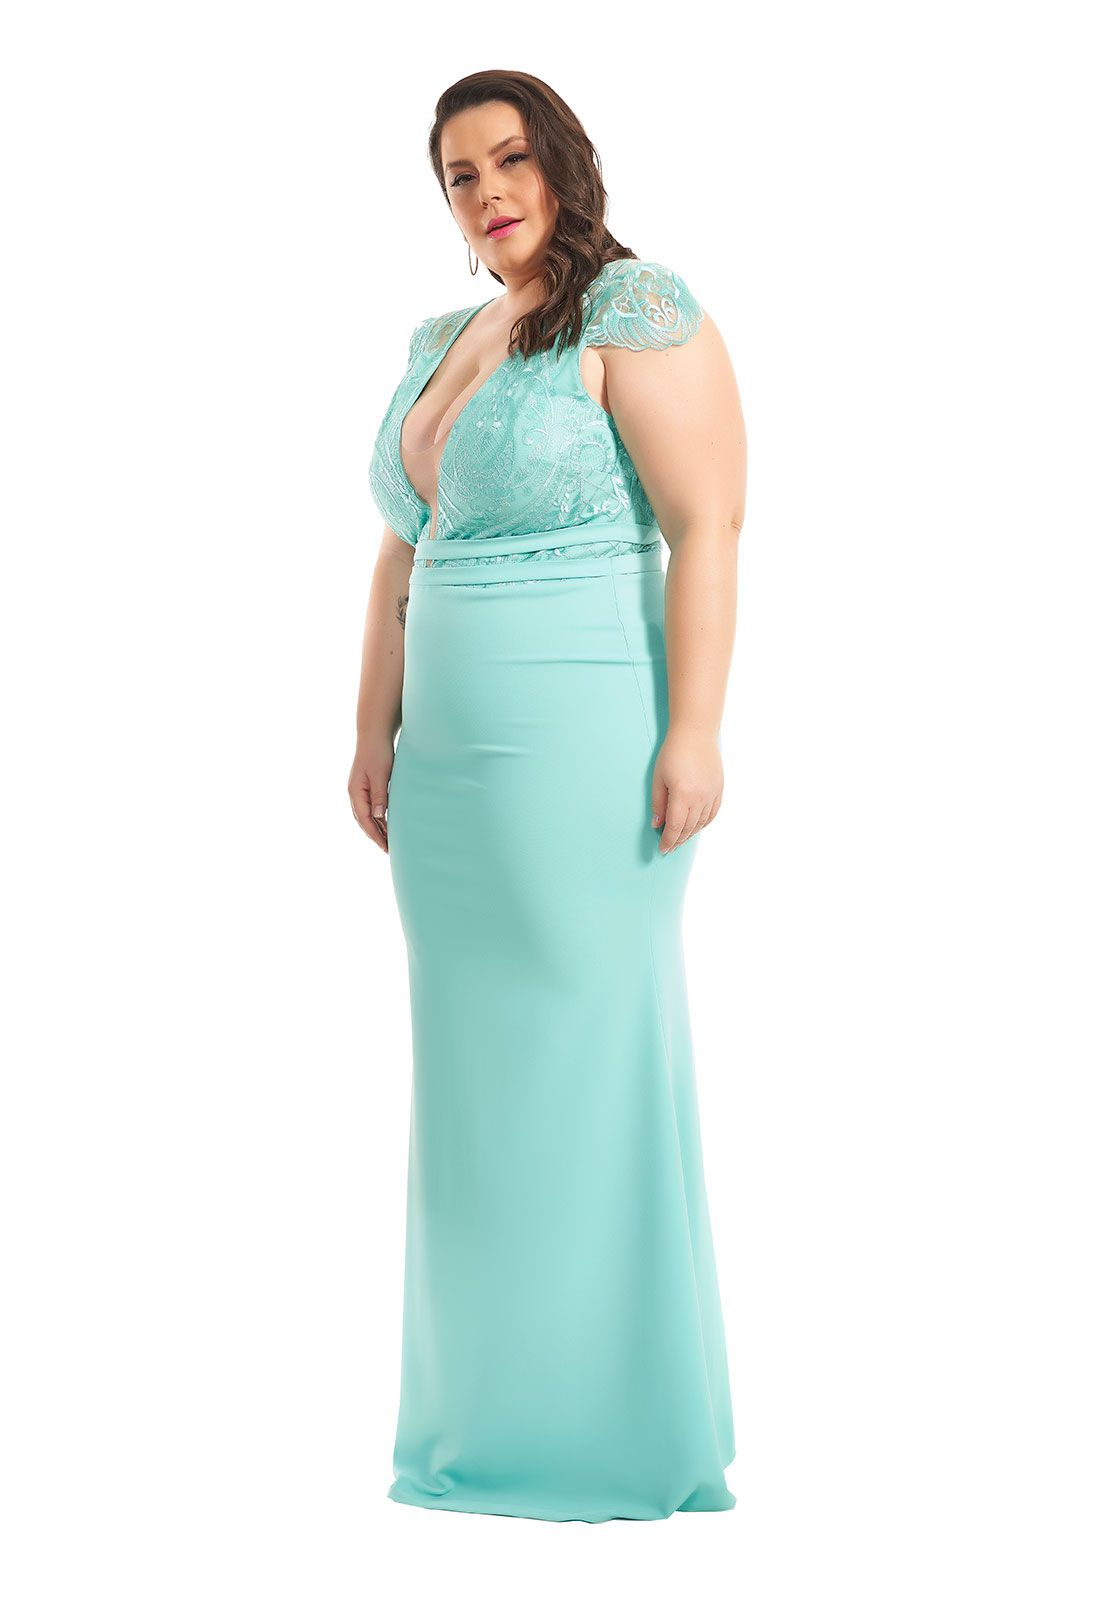 Vestido Longo Sereia Plus Size Azul Tiffany Lala Dubi